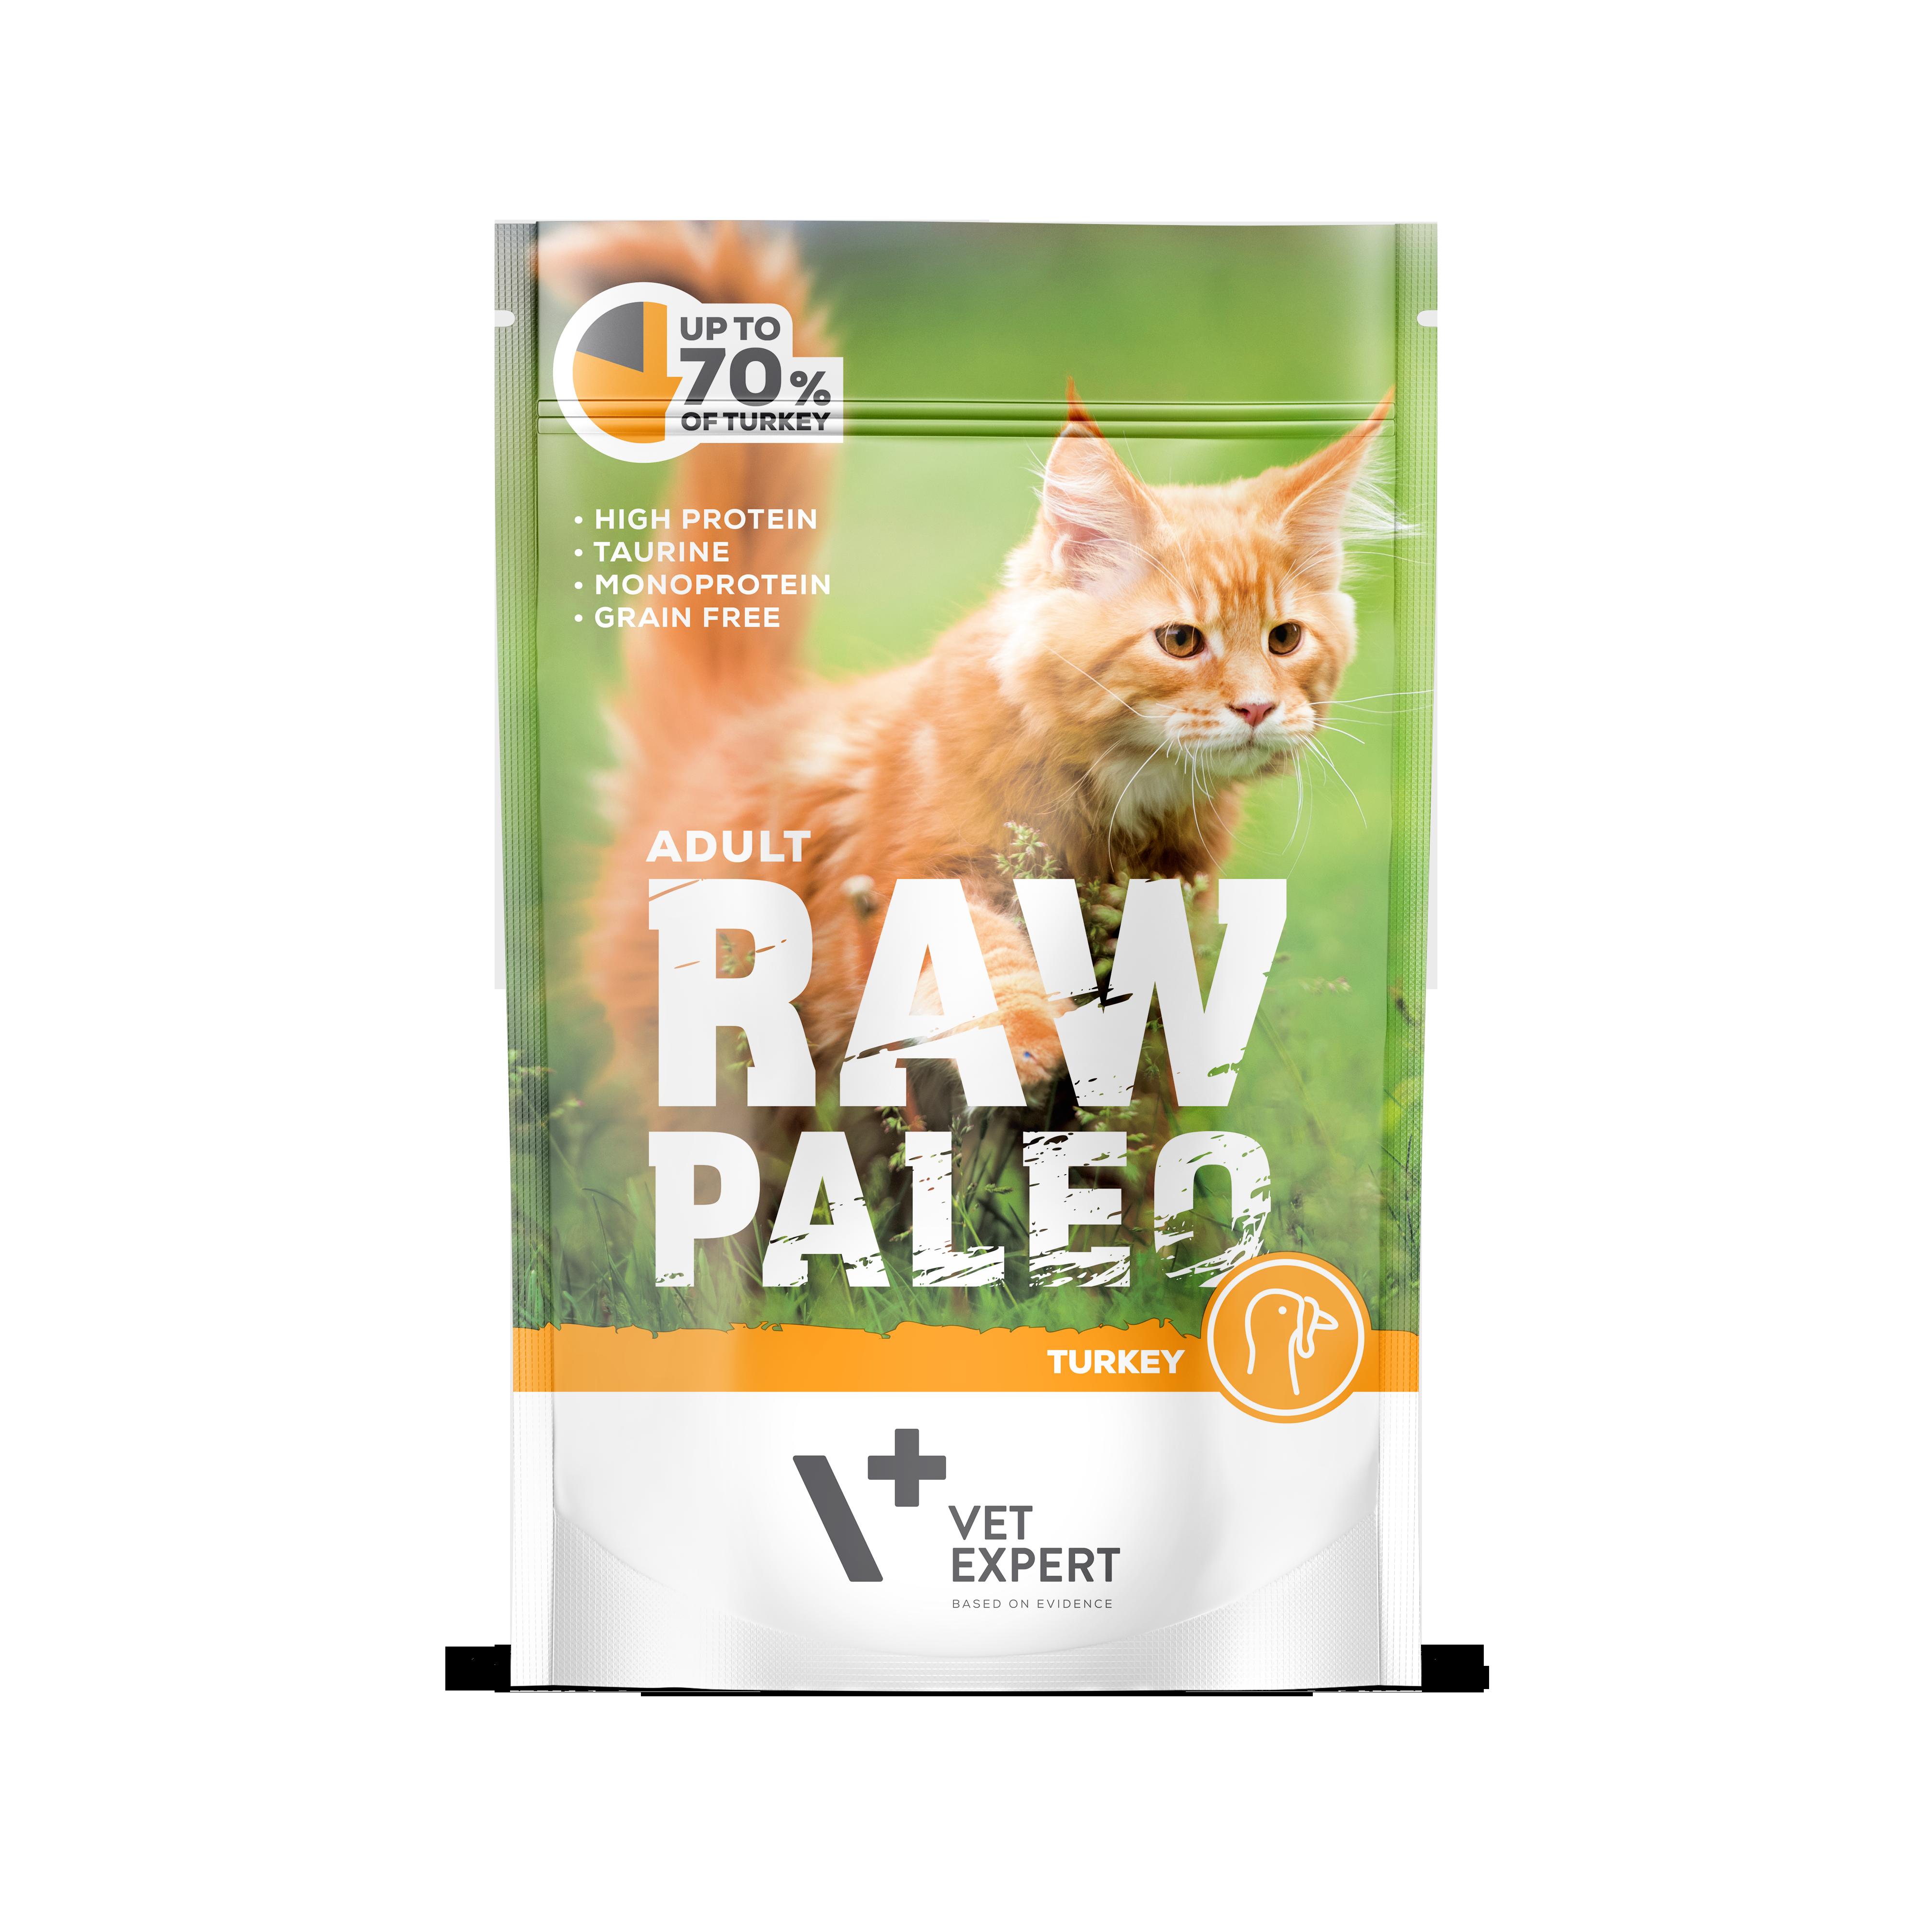 VetExpert RawPaleo Katze Adult Katzenfutter Truthahn Premium getreidefreies Katzenfutter, Alleinfuttermittel, Trockenfutter, Nassfutter, Katzenbedarf, Katzennahrung, Katzenernährung